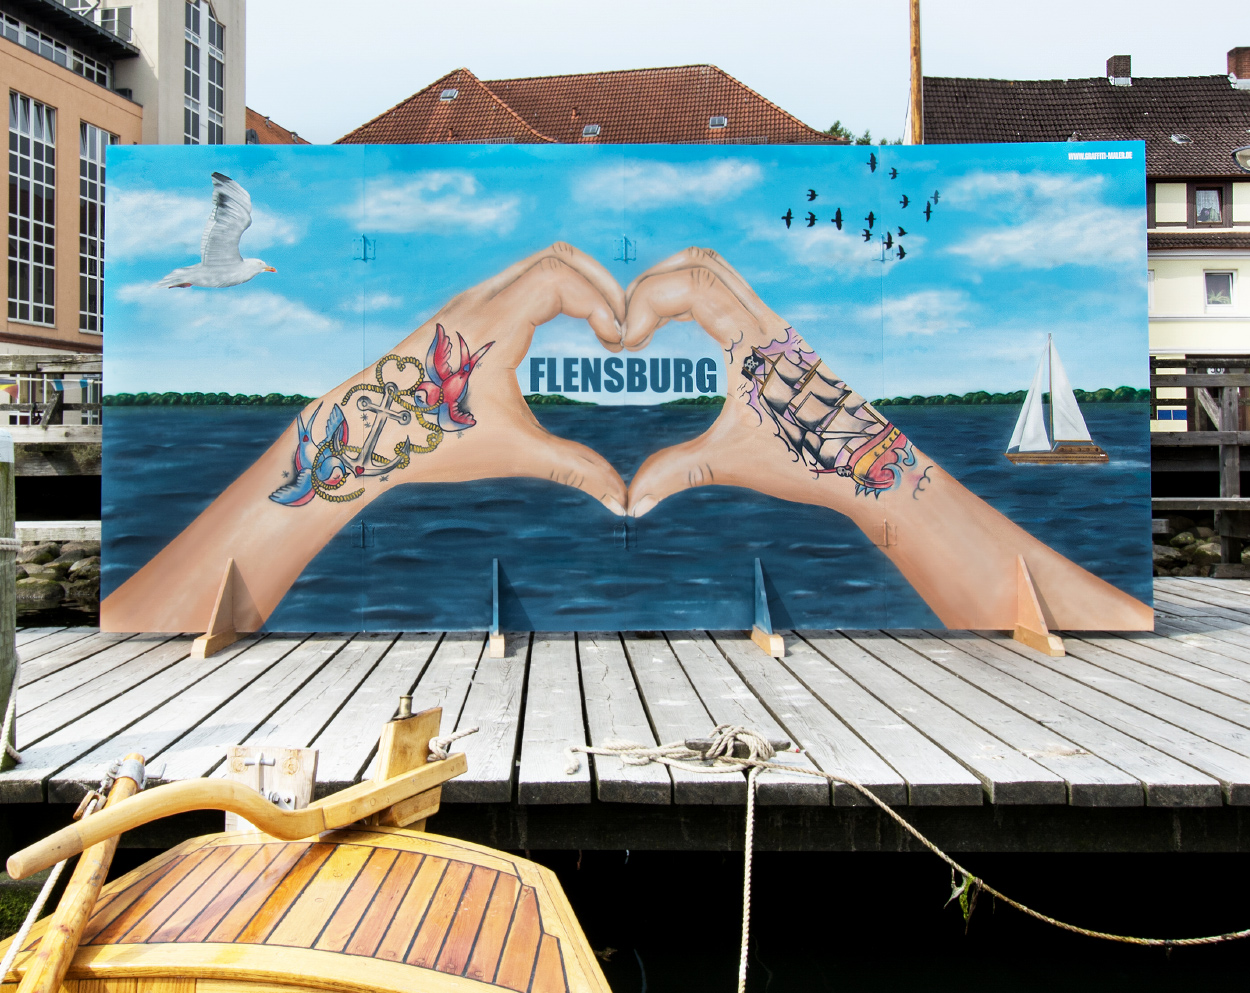 Kunst Flensburg - Graffiti Maler_ Museumshafen Tattoo